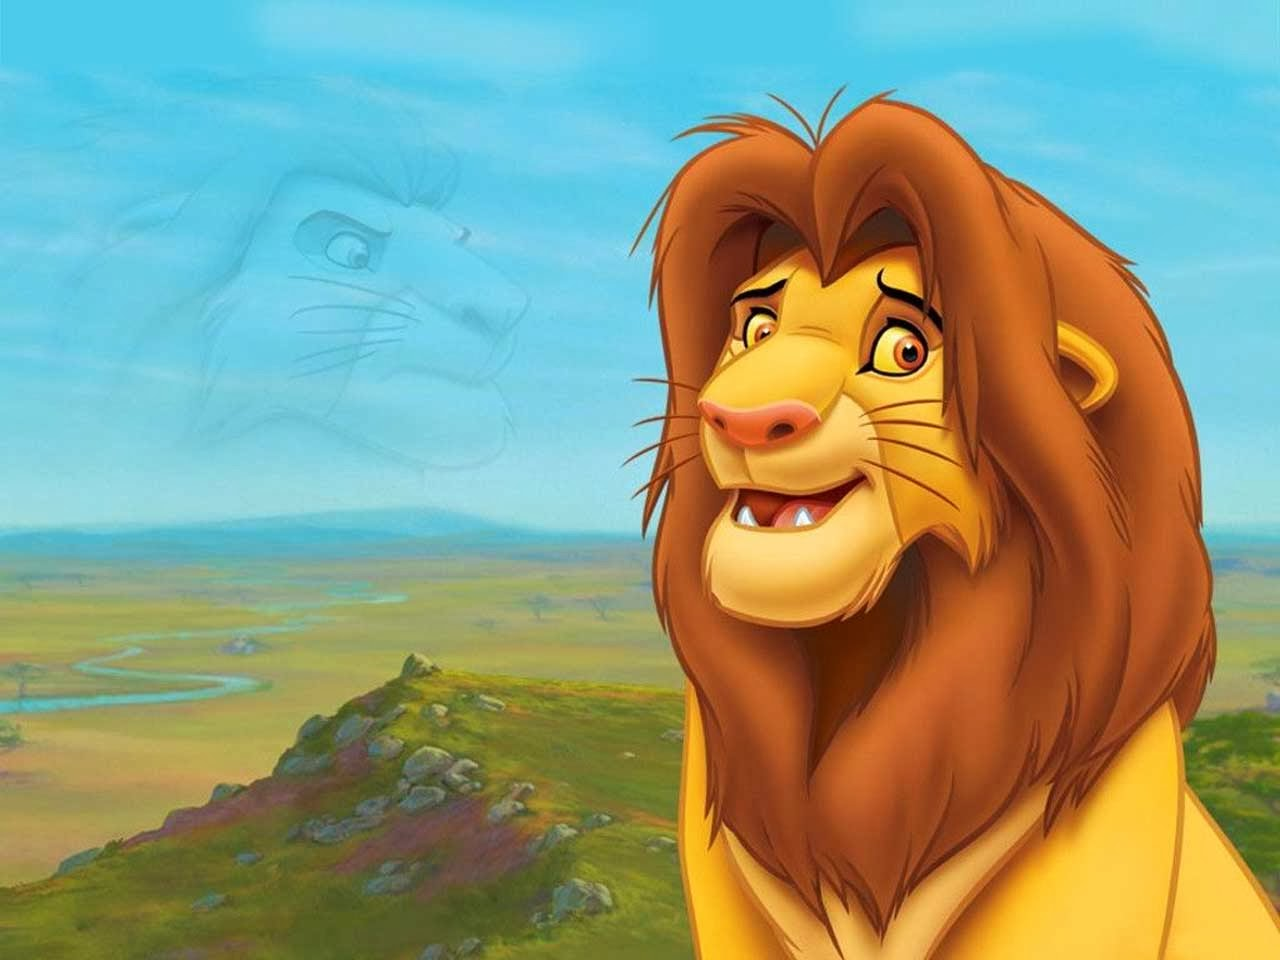 lion king computer wallpaper   beautiful desktop wallpapers 2014 1280x960